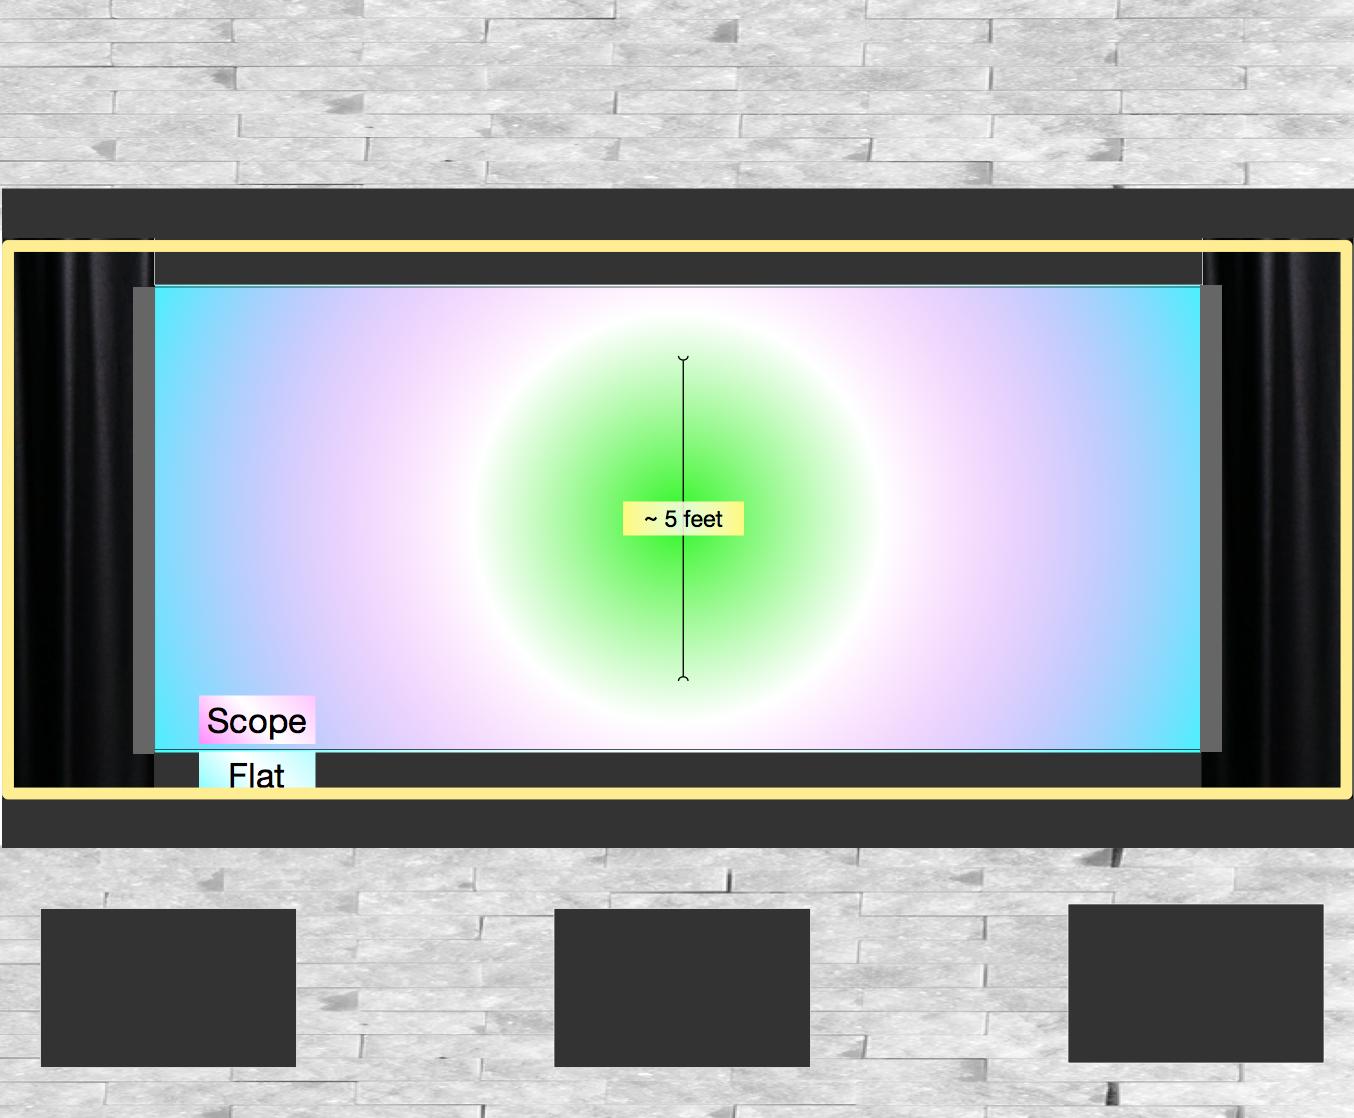 Imagen / tamaño de alcance real en caja plana en pantalla con cortinas